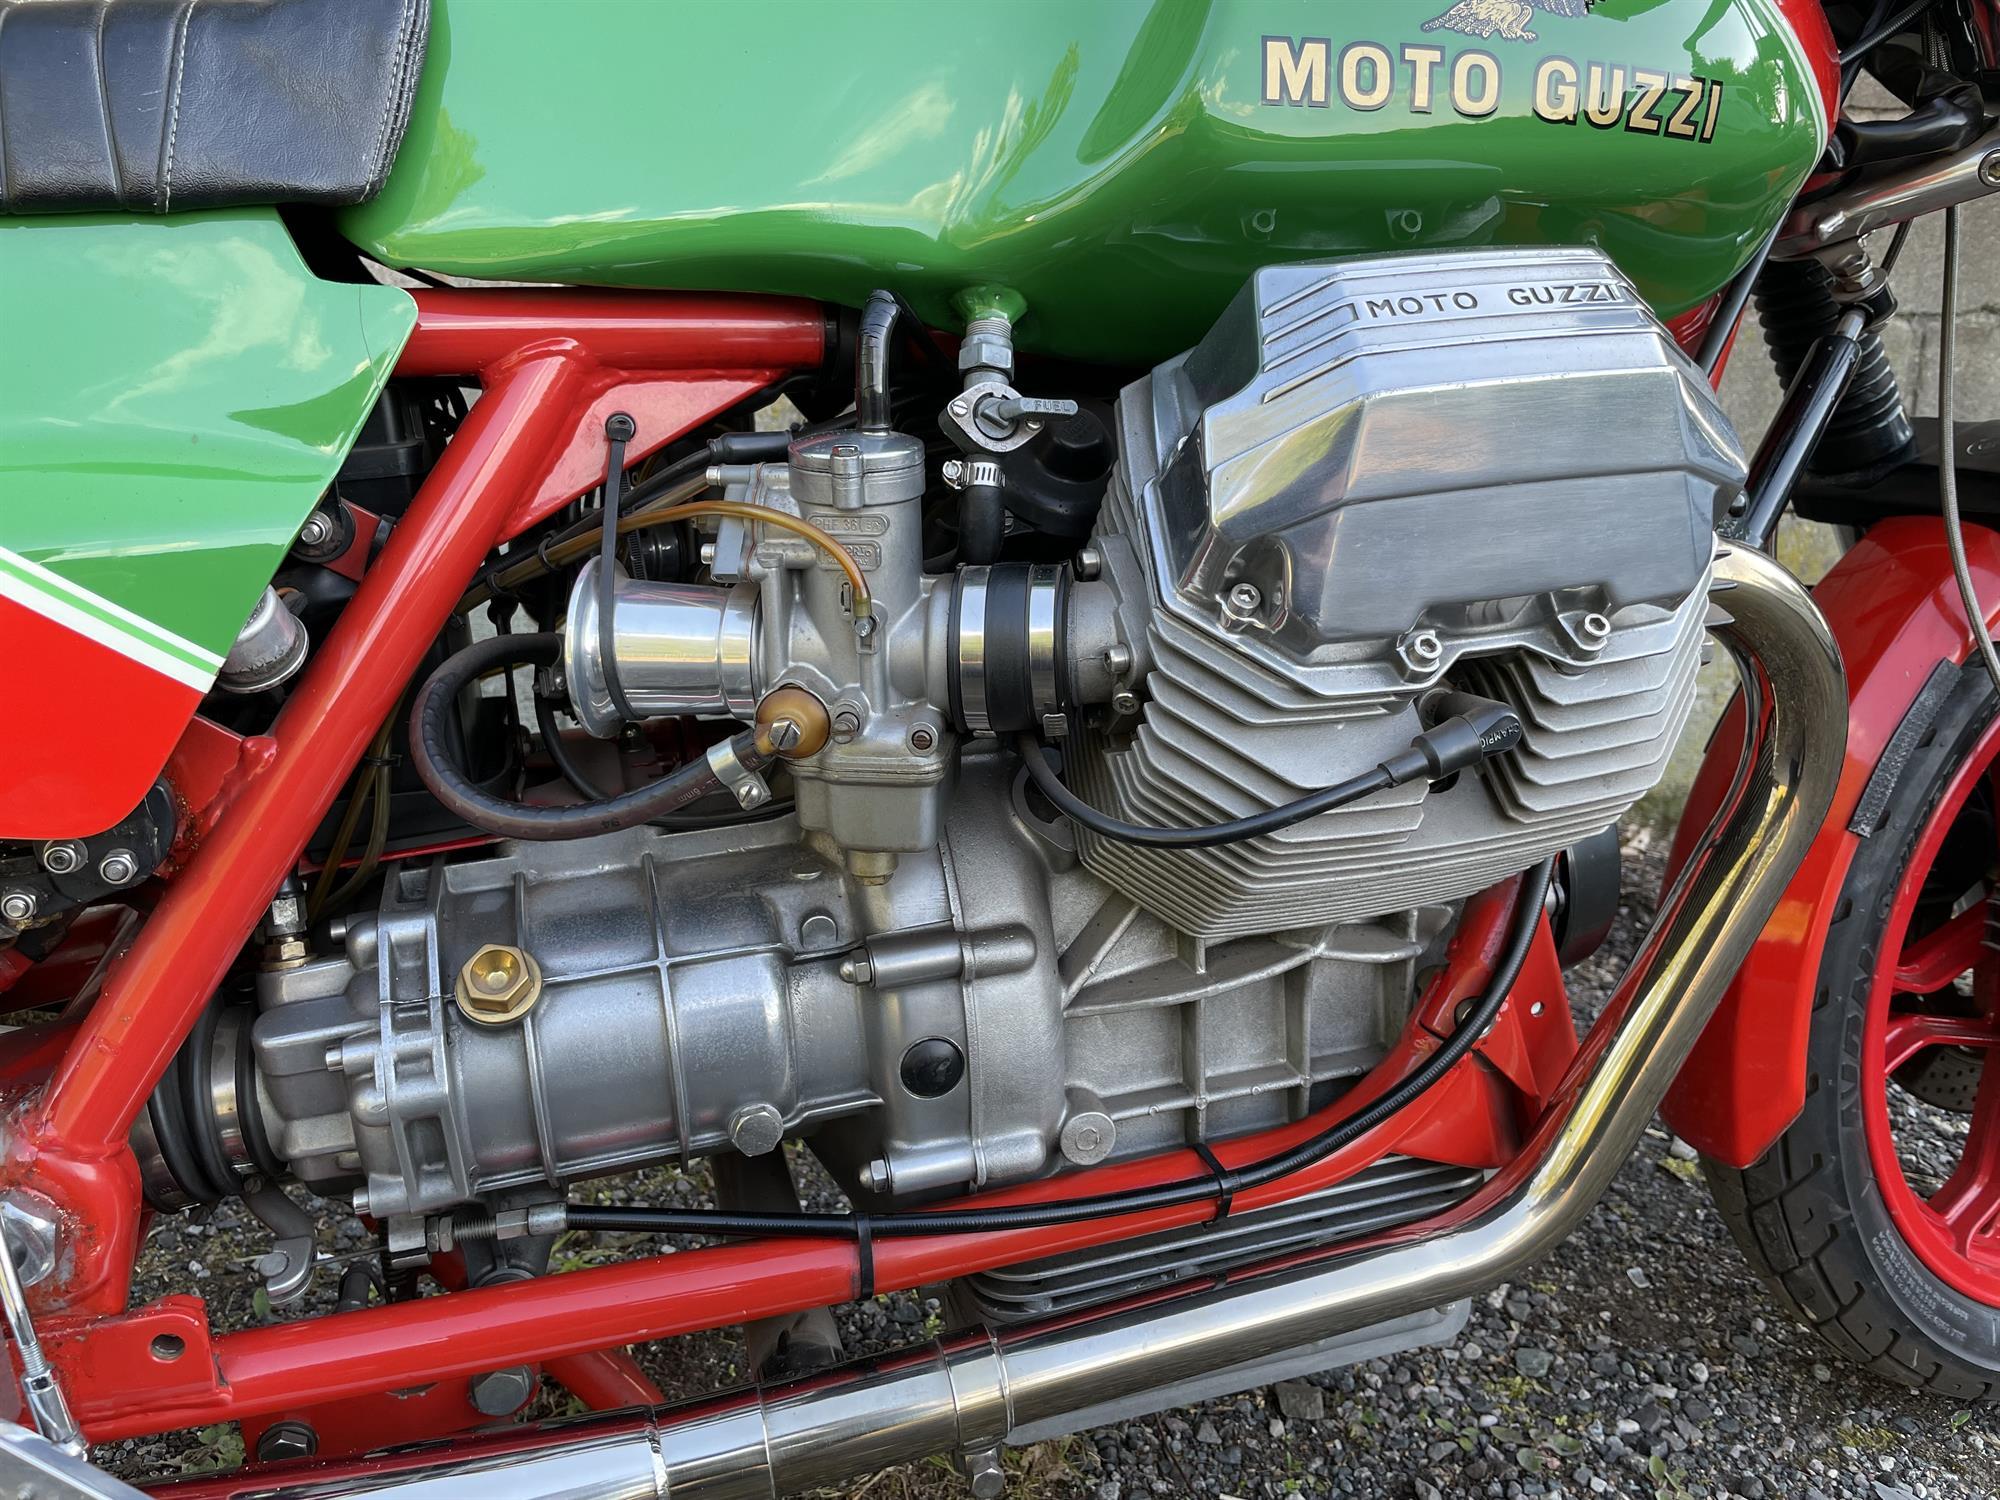 1983 Moto Guzzi 850 Le Mans III - Image 4 of 10